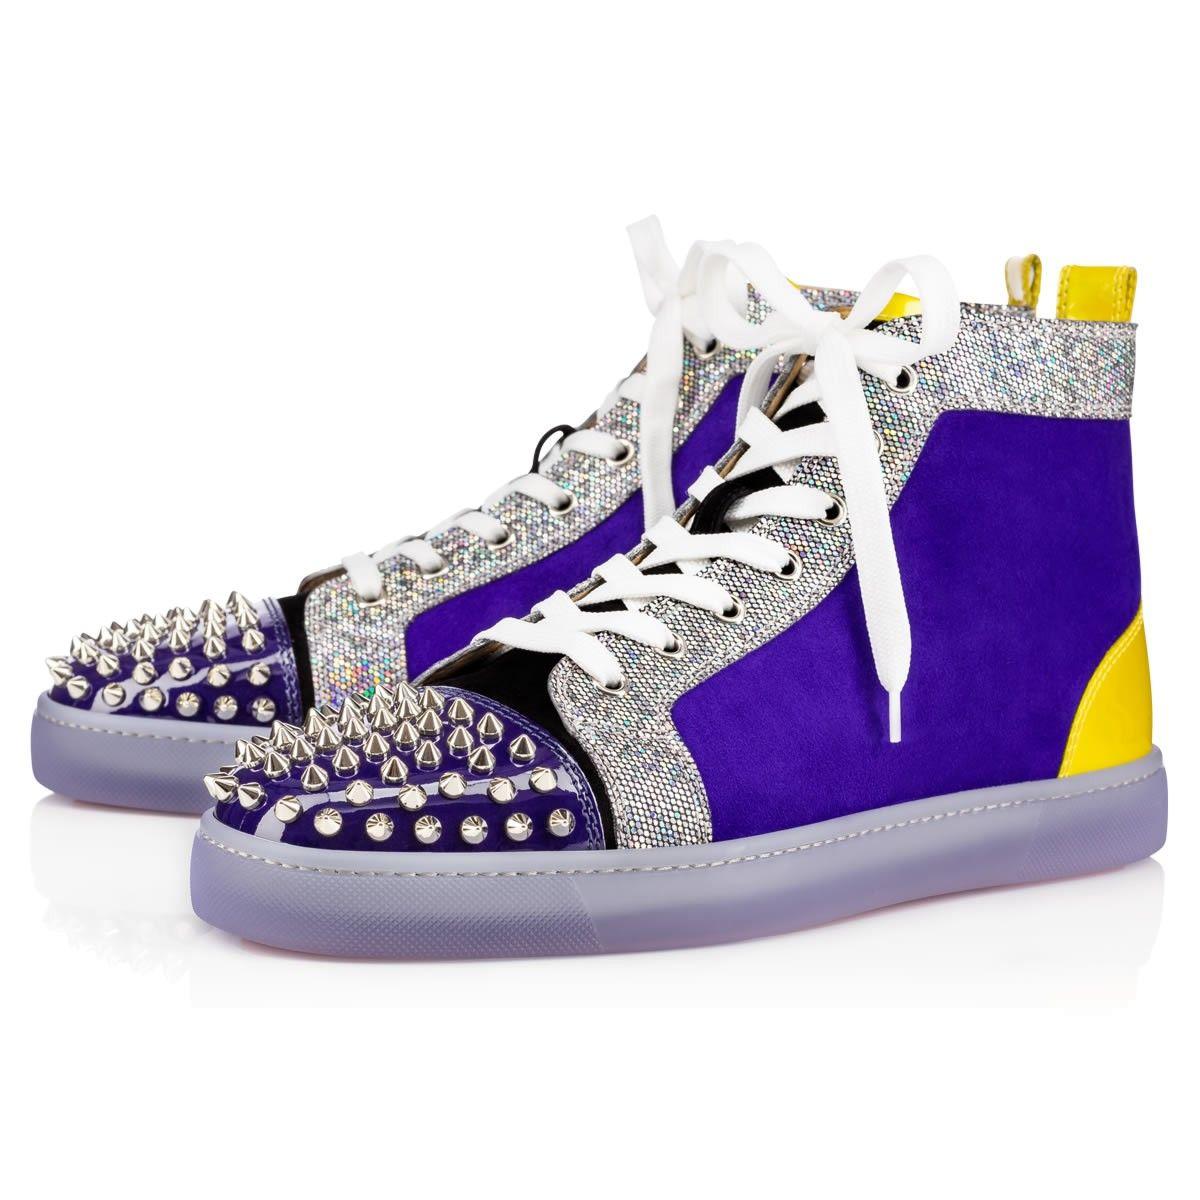 d5490262269d CHRISTIAN LOUBOUTIN Lou Spikes Glitter Disco Ball Multicolor Glitter Canvas  - Men Shoes - Christian Louboutin.  christianlouboutin  shoes